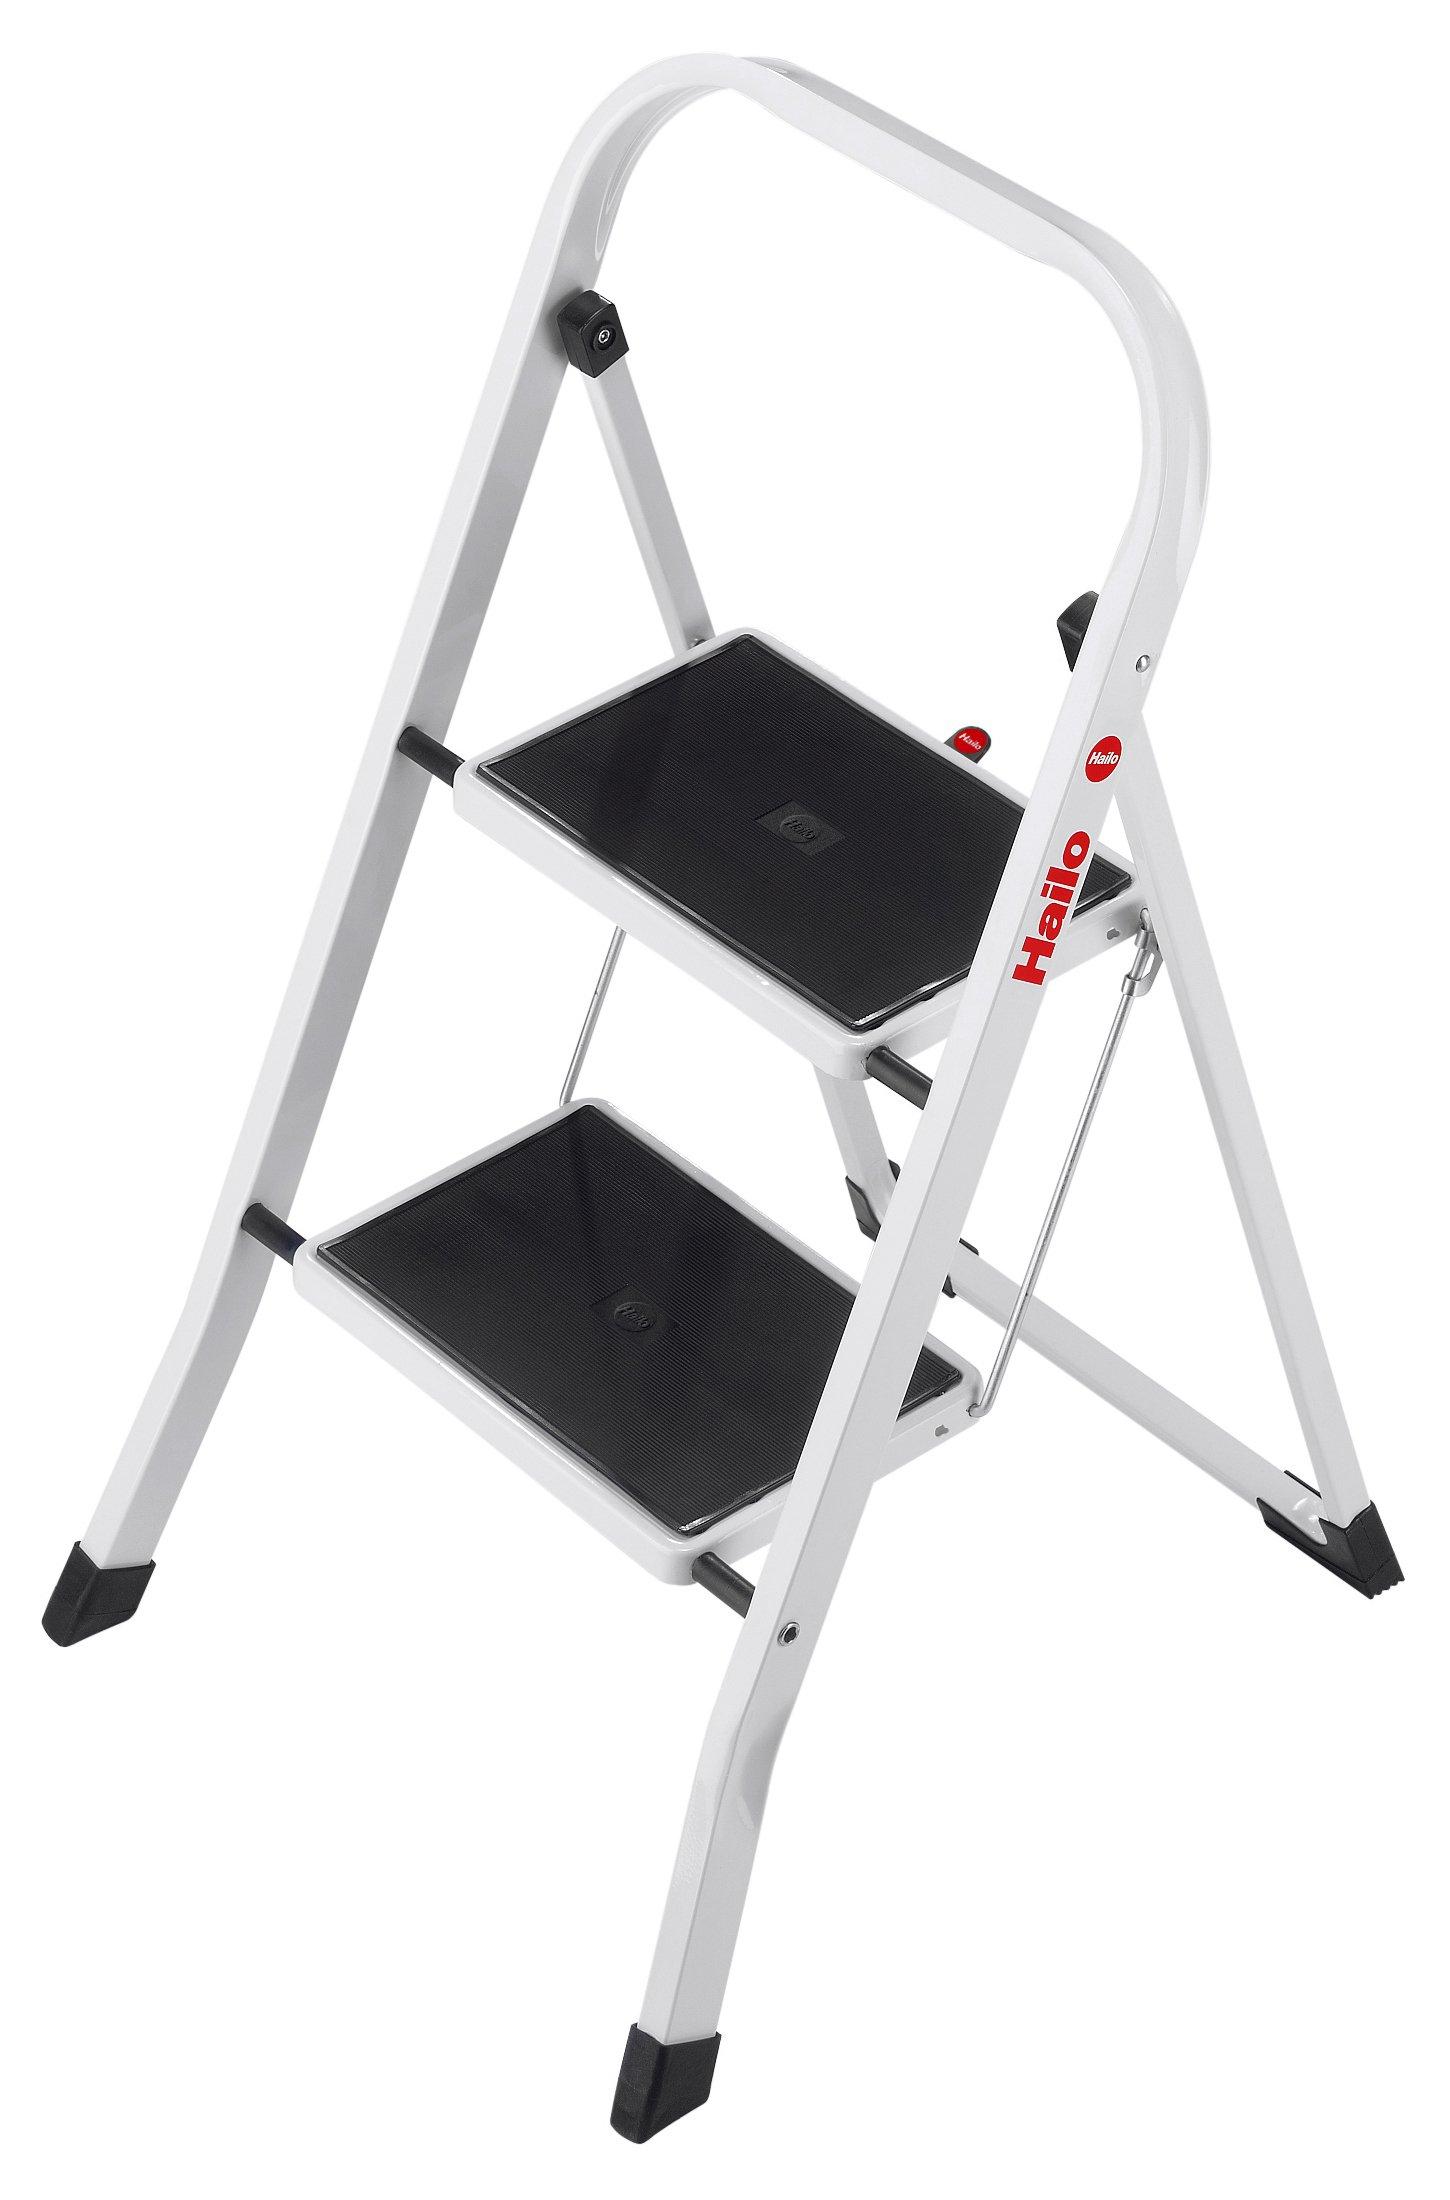 Hailo 9204015095 K20 Step Ladder